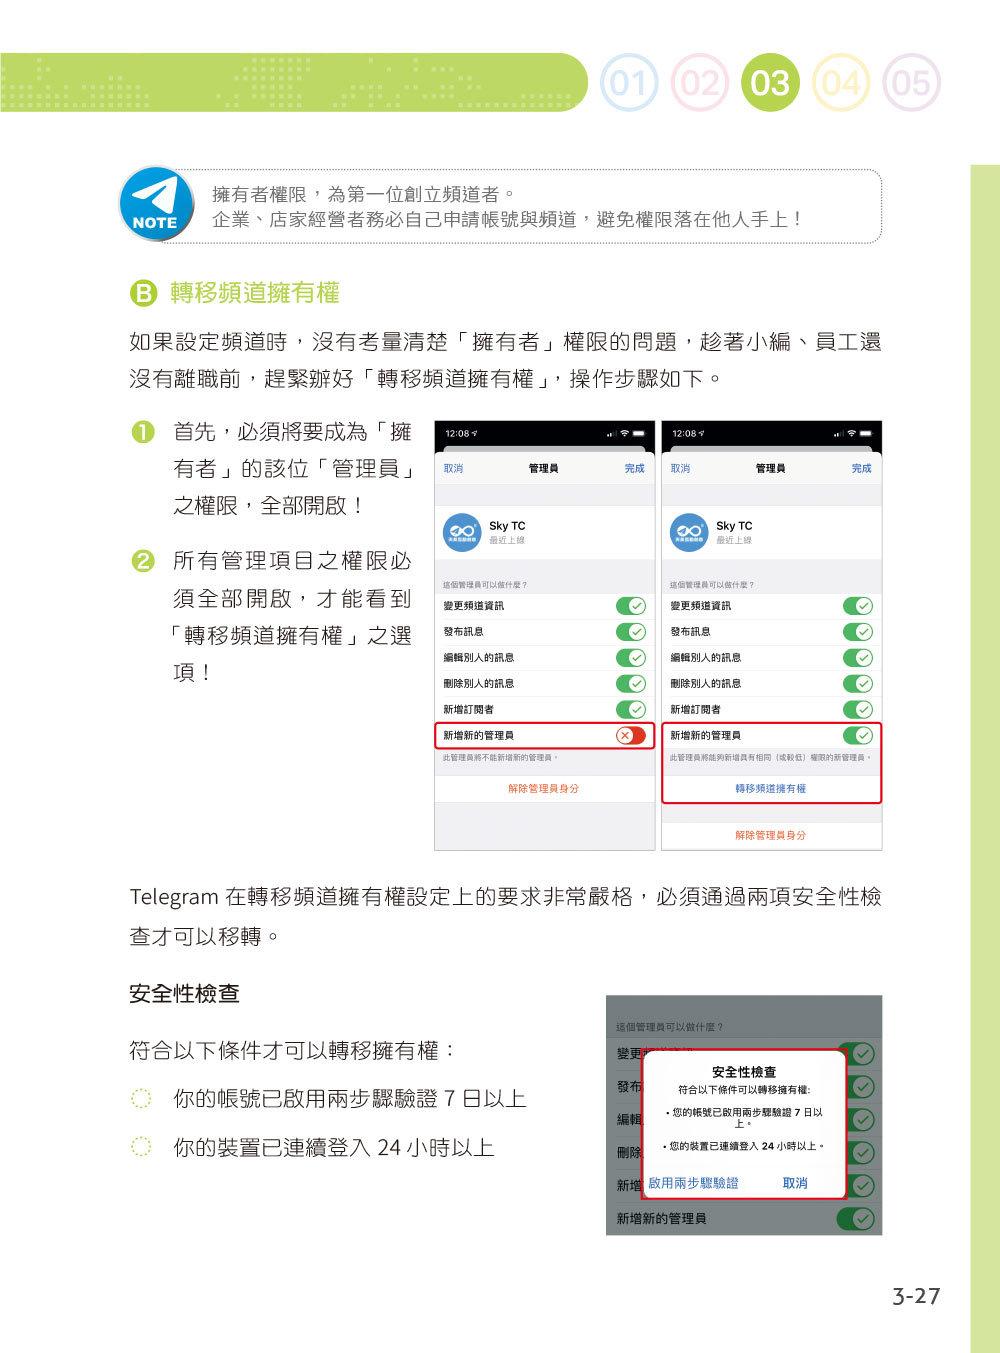 Telegram 行動行銷|操作技巧x品牌貼圖x經營心法-preview-7